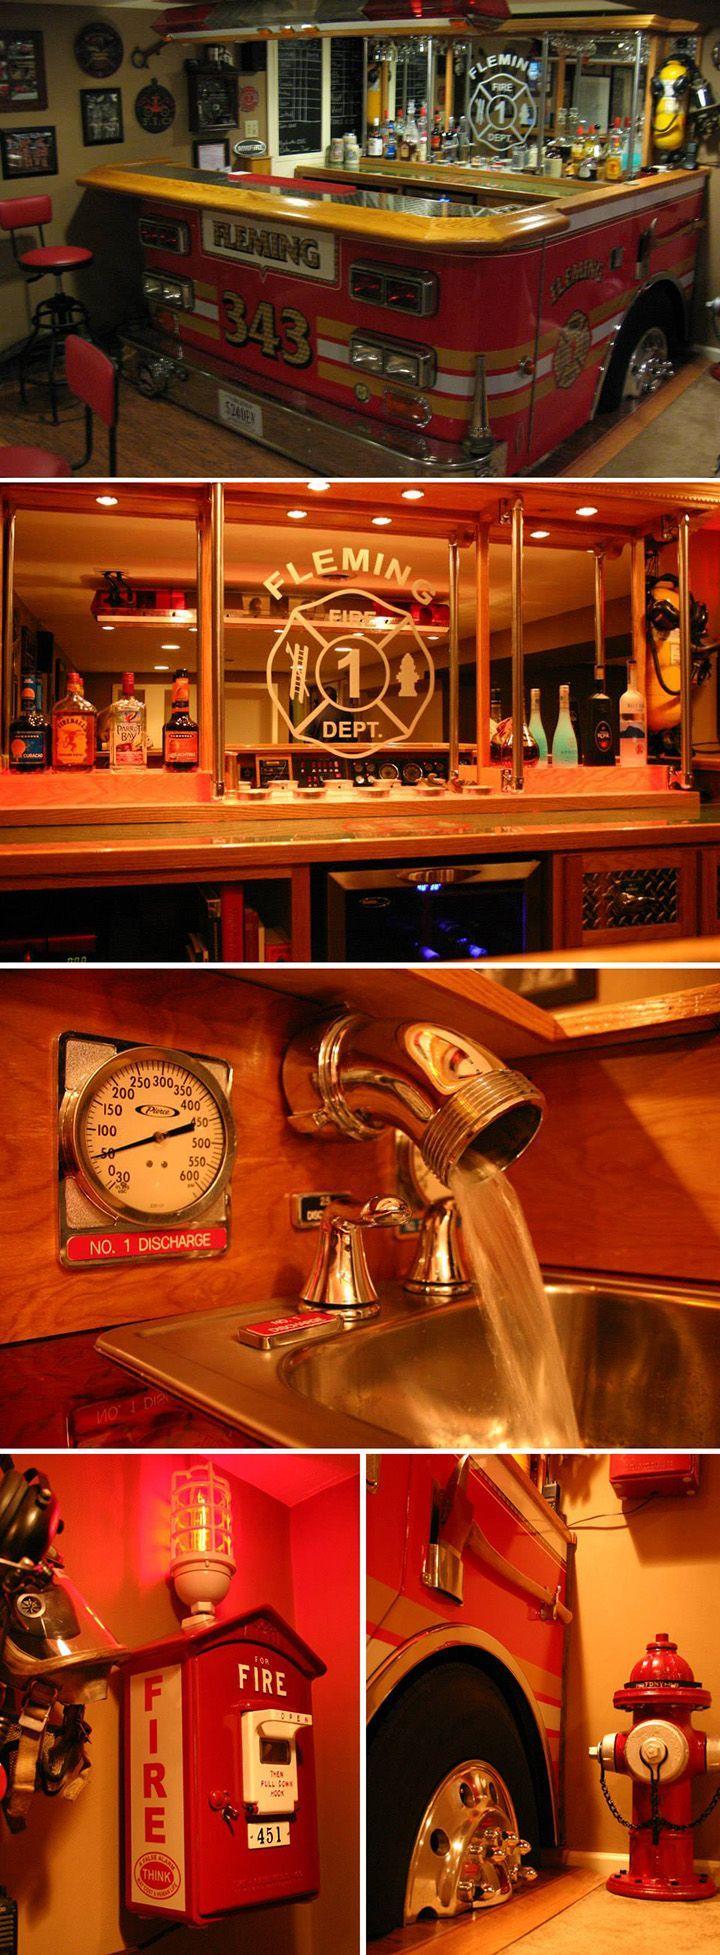 DIY Firefighter Man Cave Inspiration: Fleming Fire Truck Bar | Shared by LION